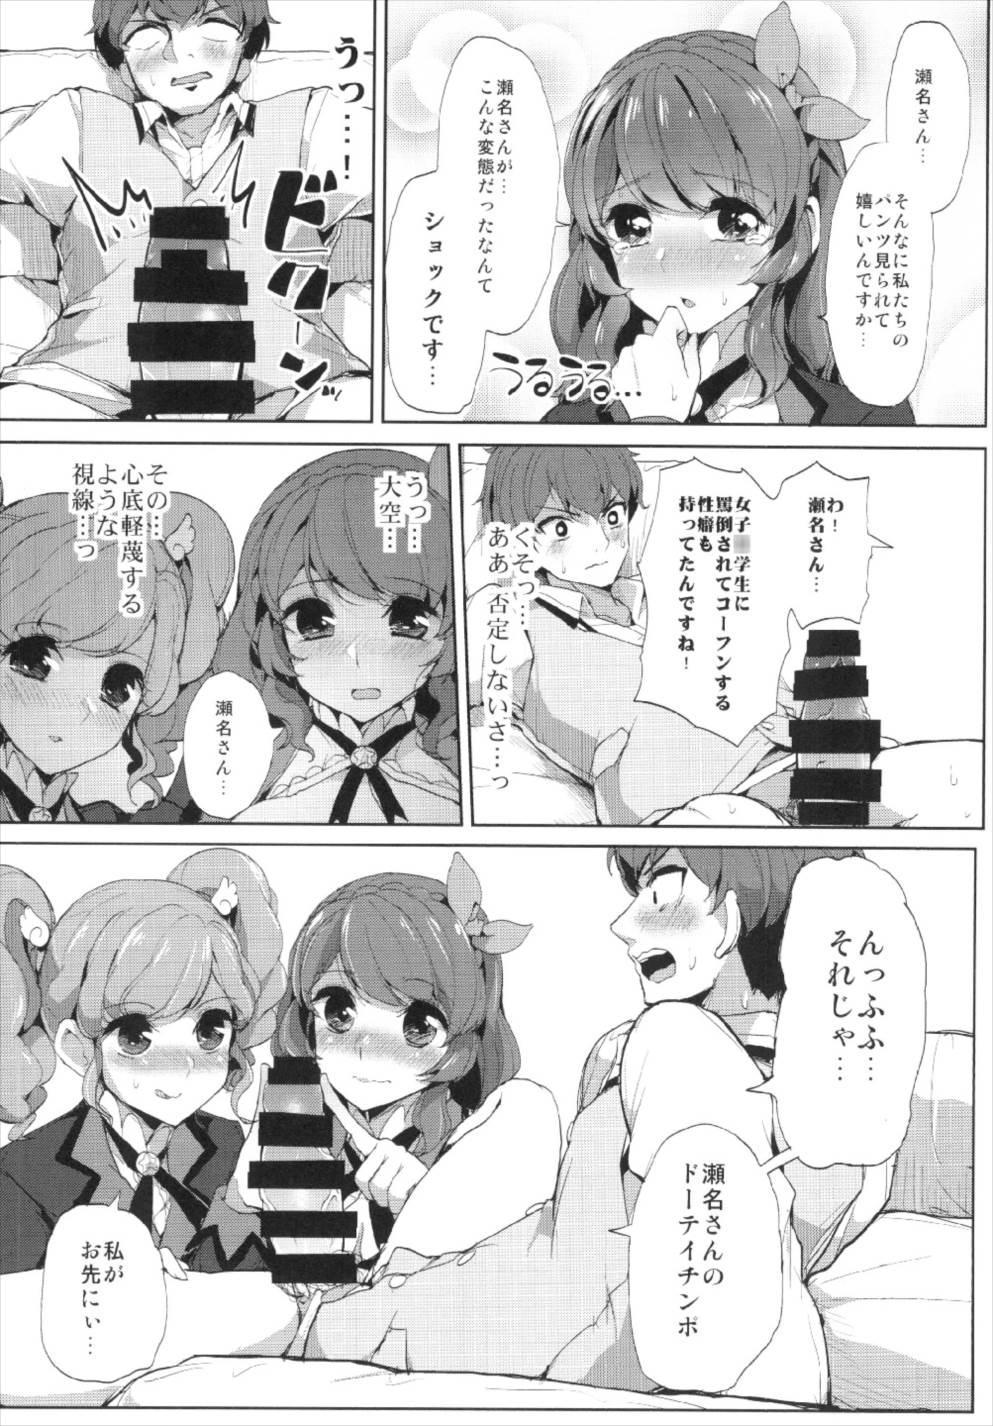 Sena-san Saitte Desu♥ 9